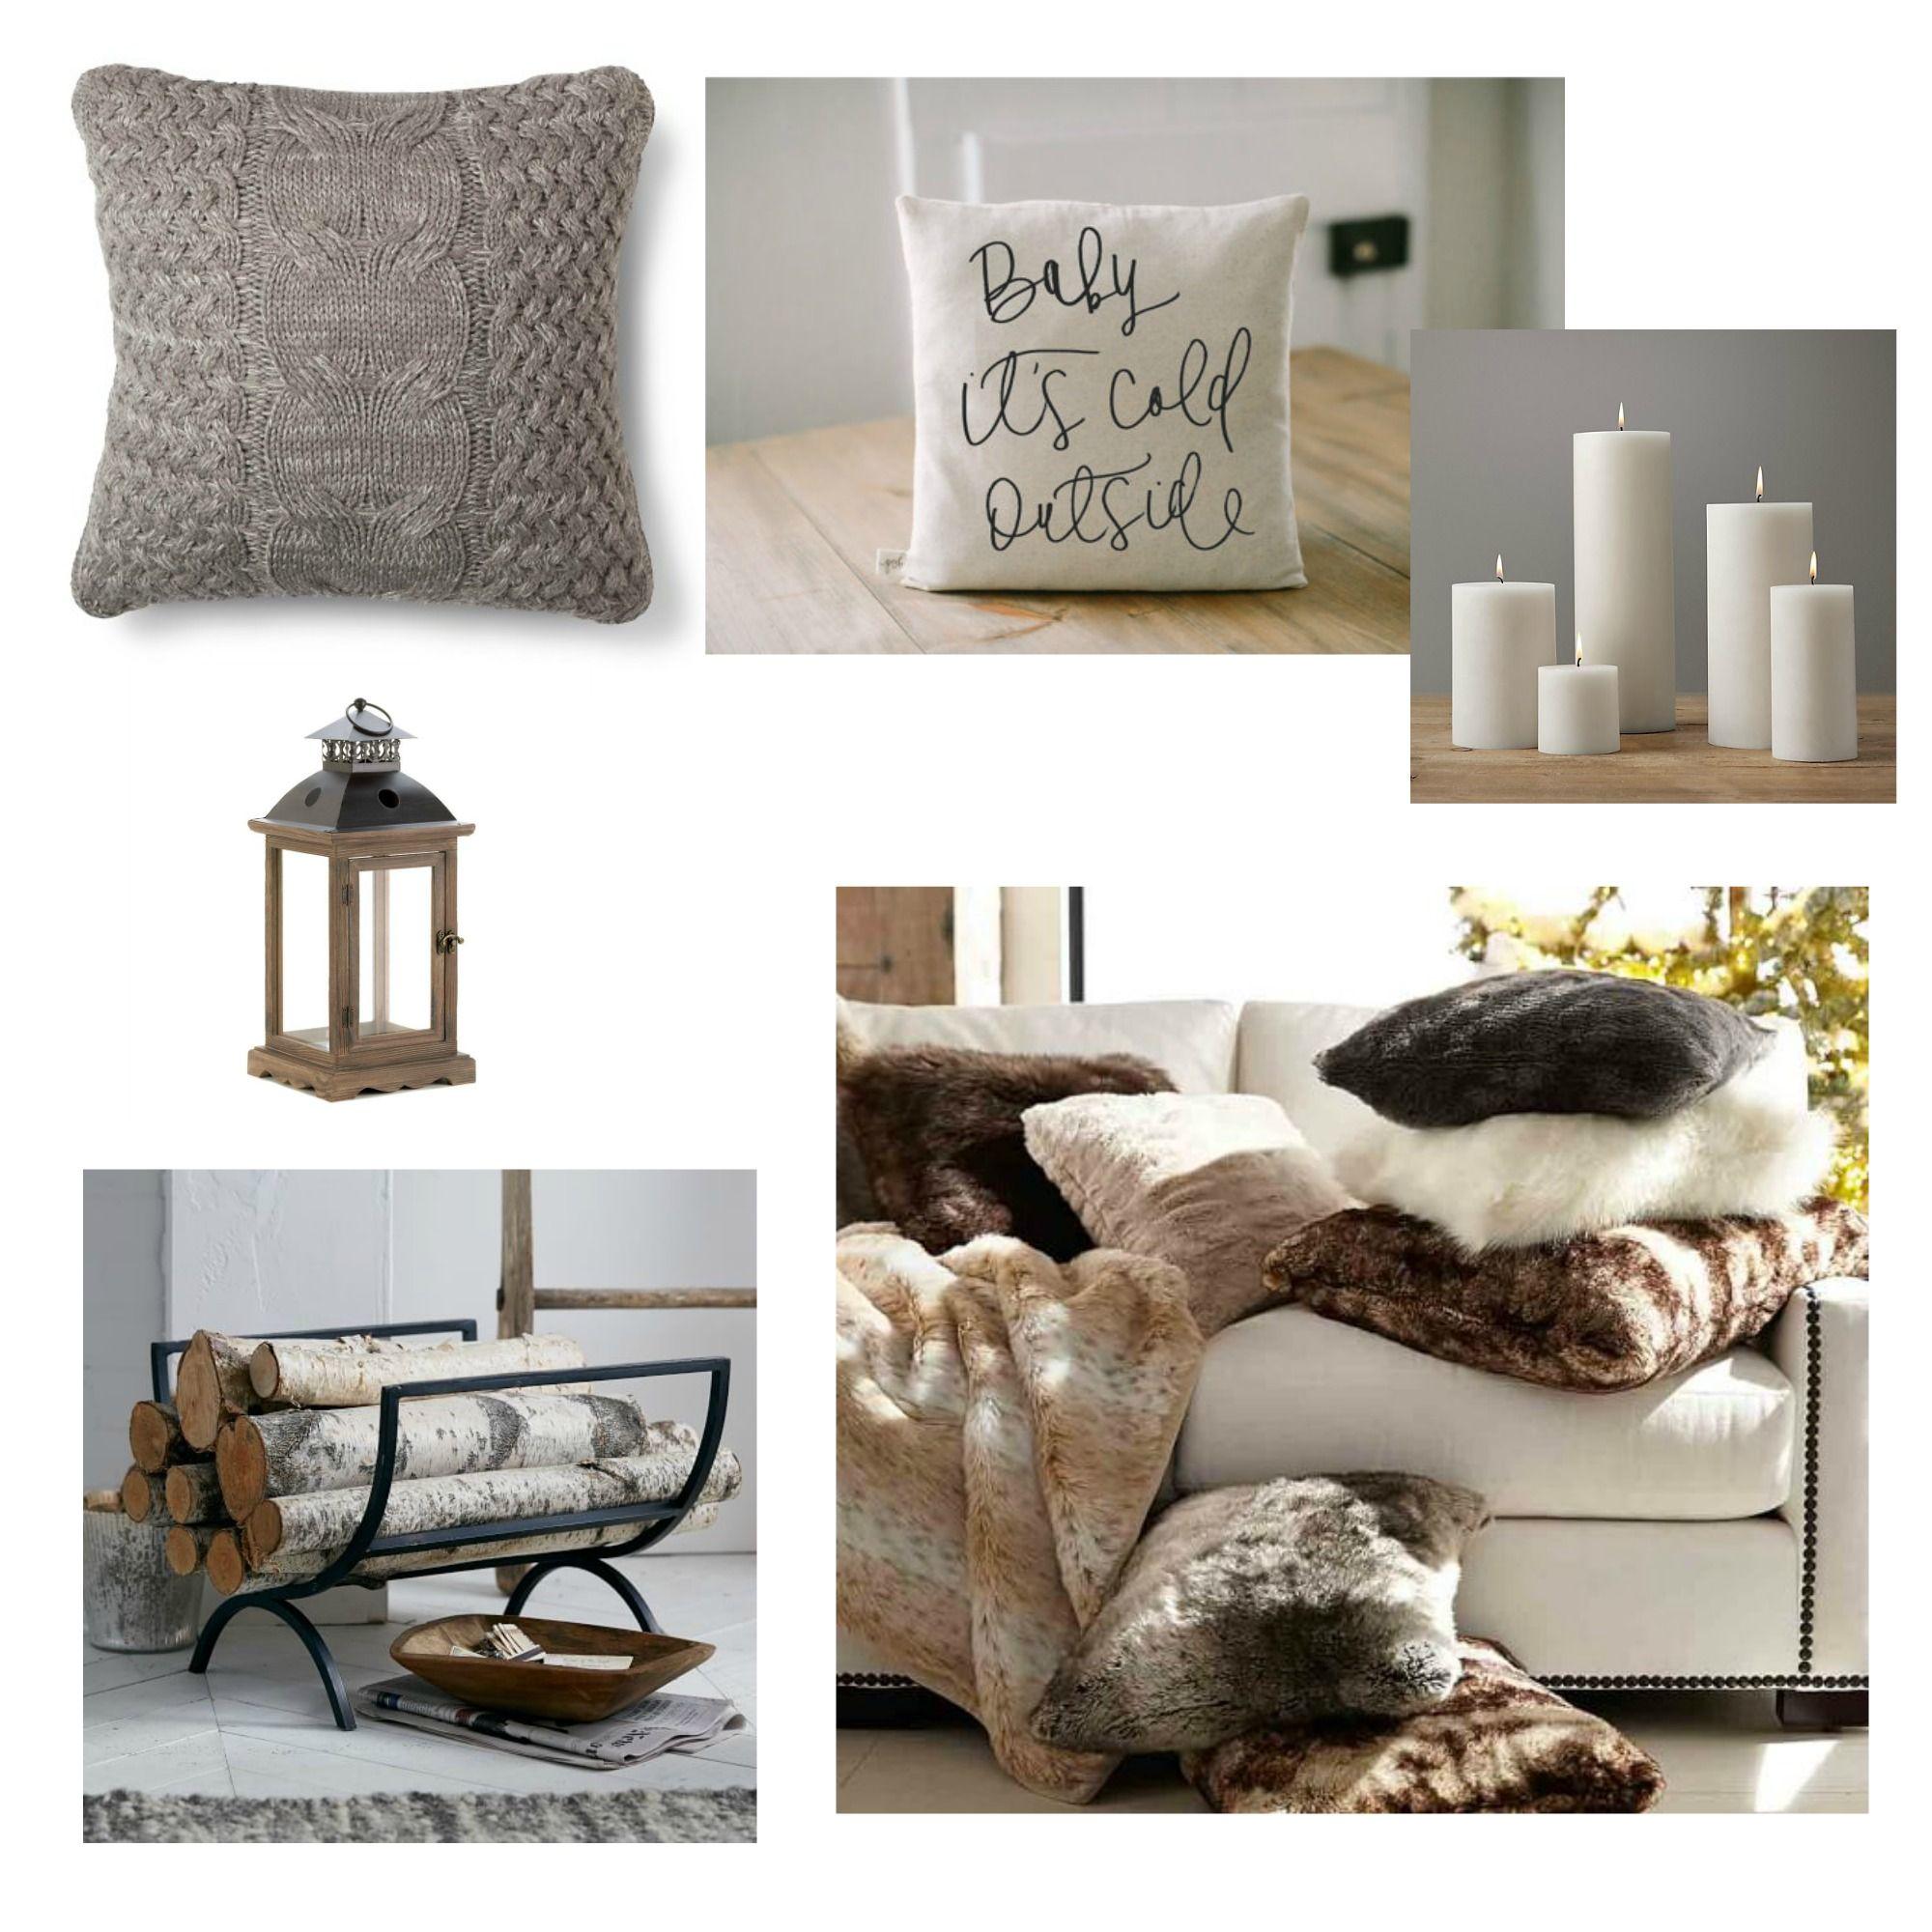 Cozy Home Decor Ideas – cozy home decor tumblr, cozy home | Home ...